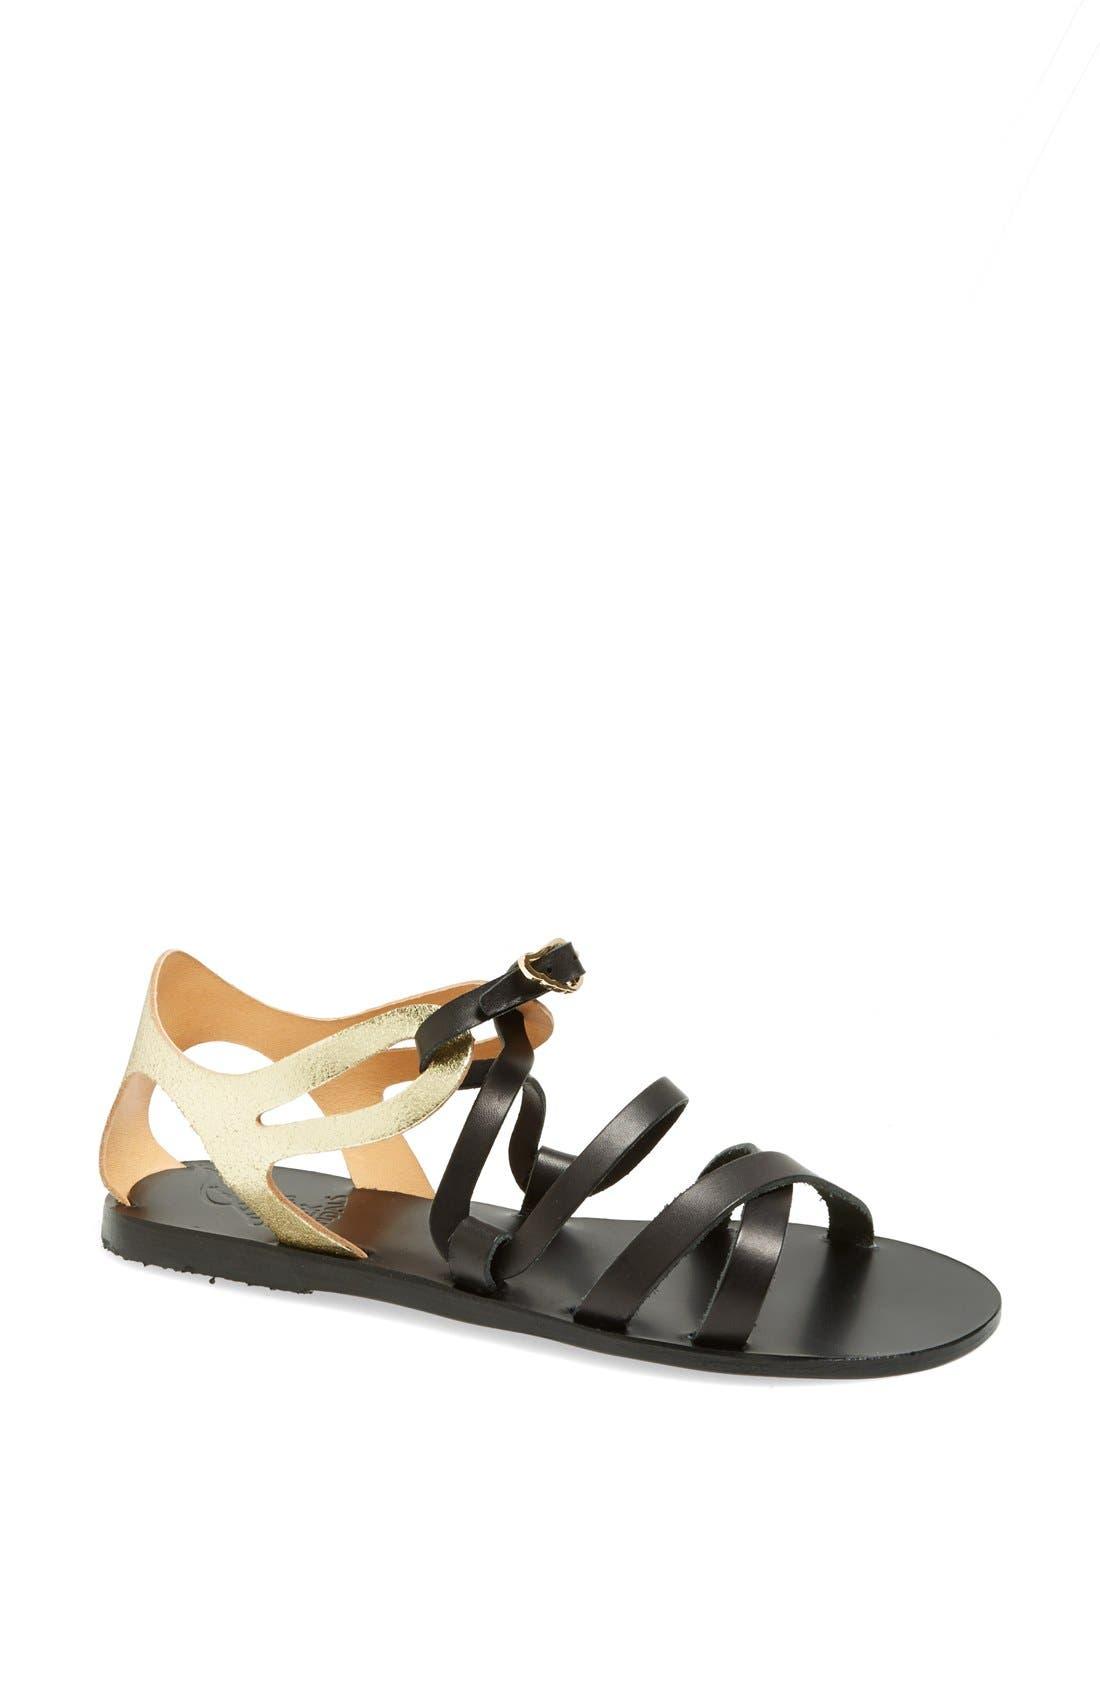 Main Image - Ancient Greek Sandals 'Ellie' Leather Ankle Strap Sandal